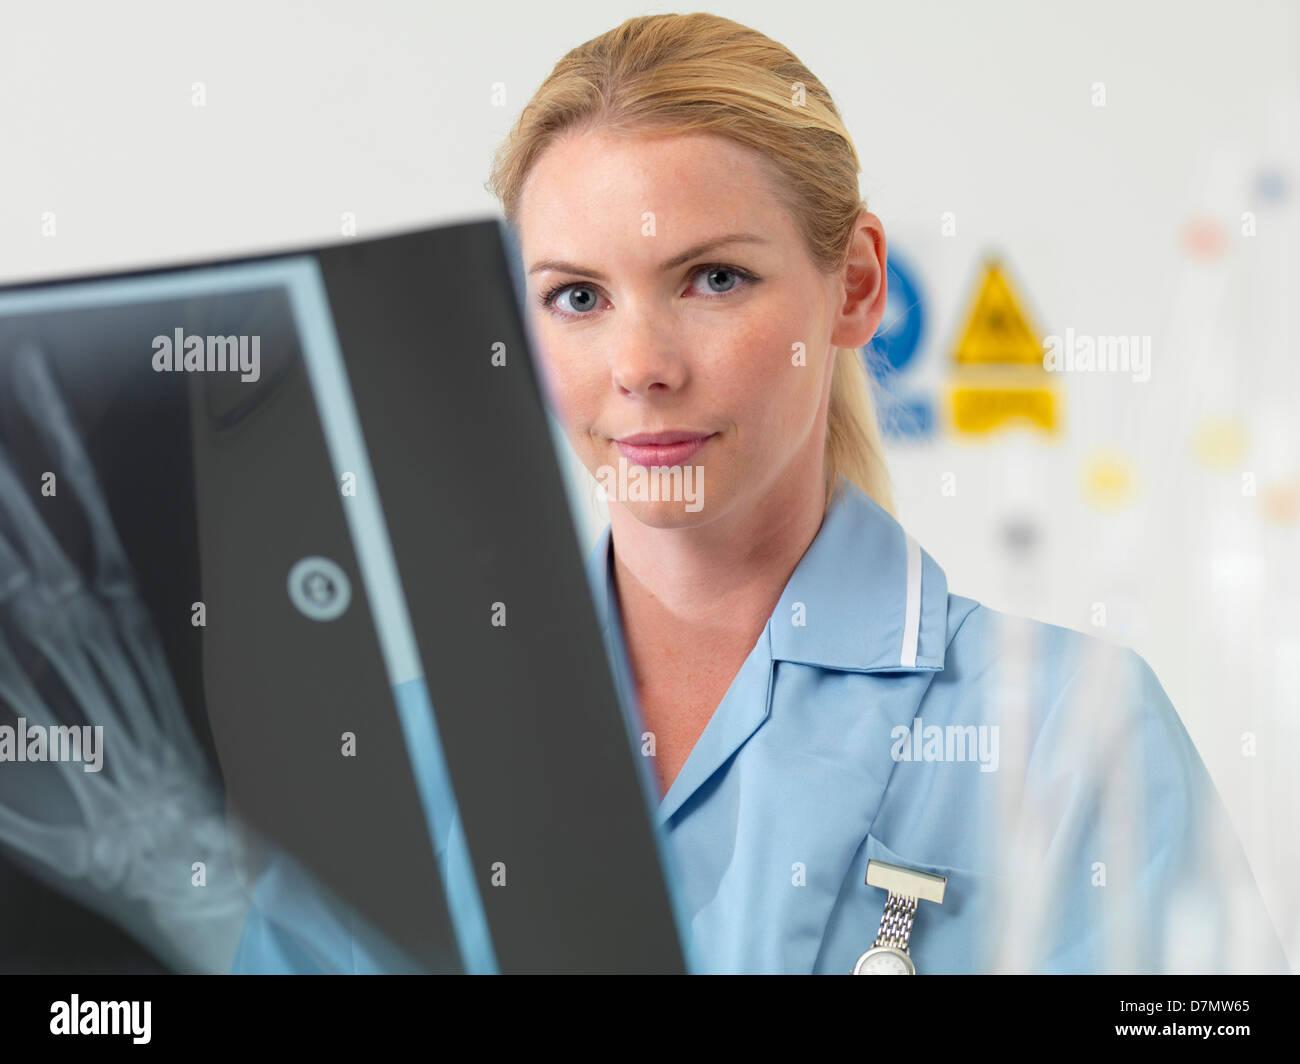 Radiologist examining an X-ray - Stock Image